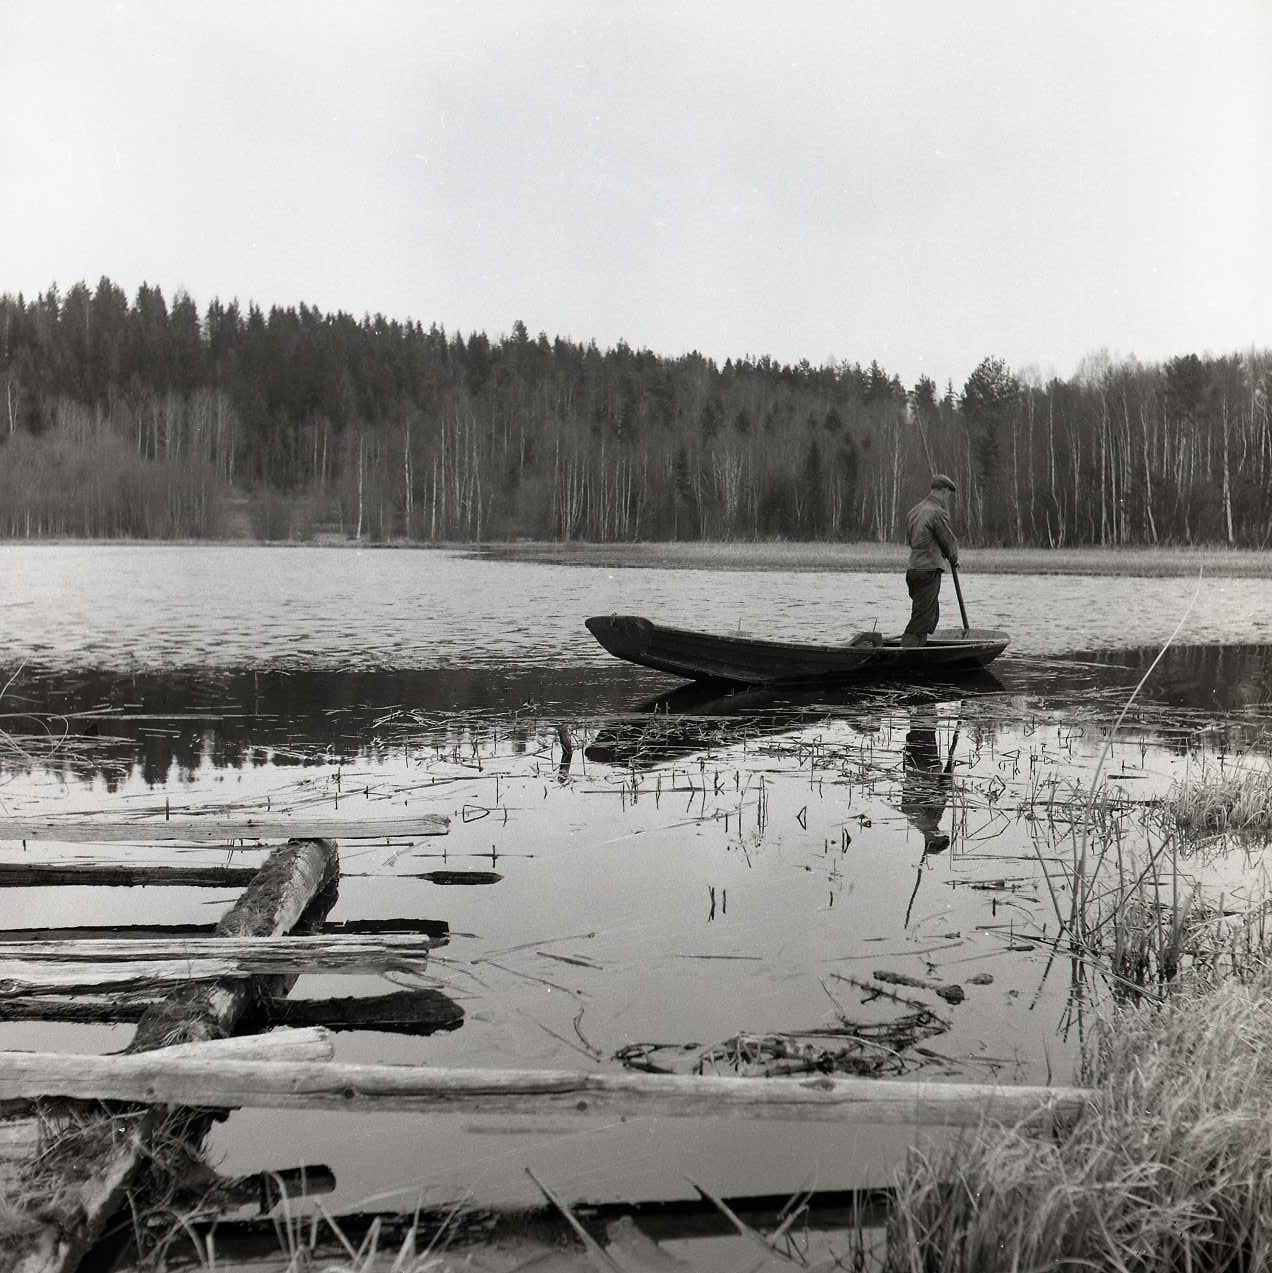 M 115 977: Vårfiske Olers Erik i Bergatjärn 28 april 1954. Foto: Hilding Mickelsson